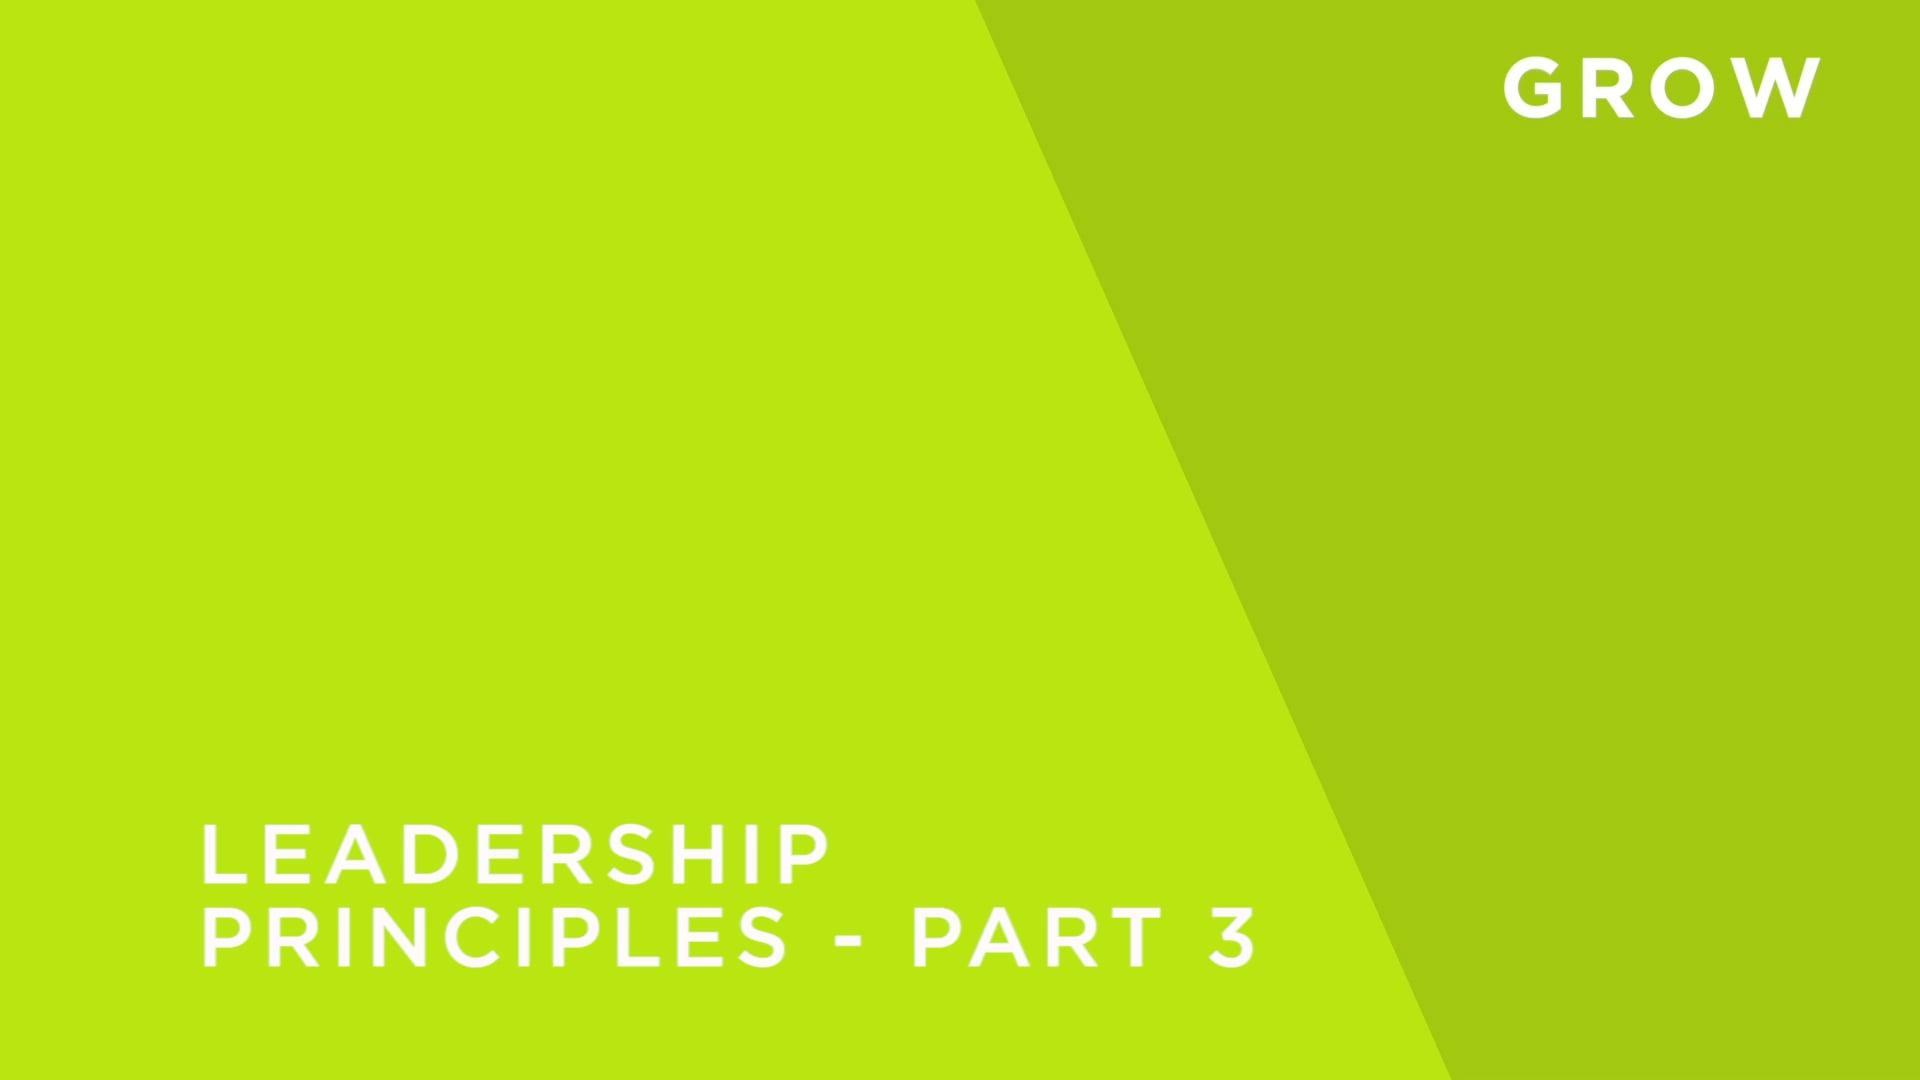 Leadership Principles - Part 3